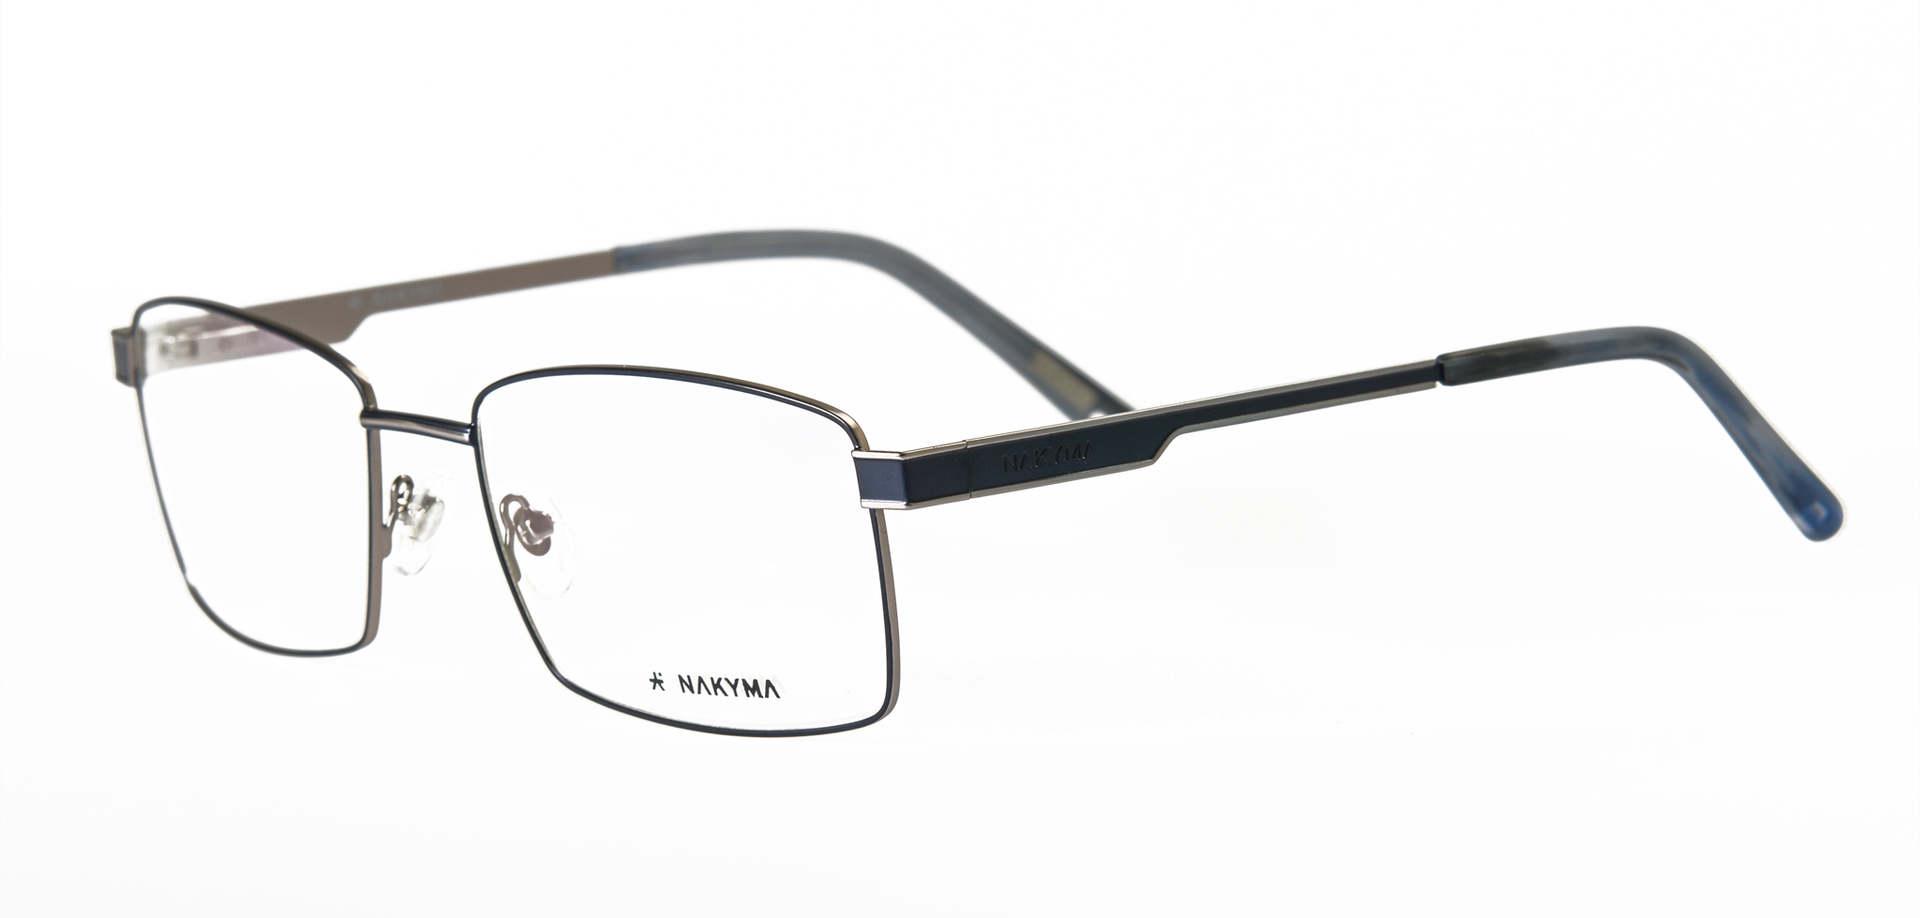 8R1-NAKYMA-05 C3